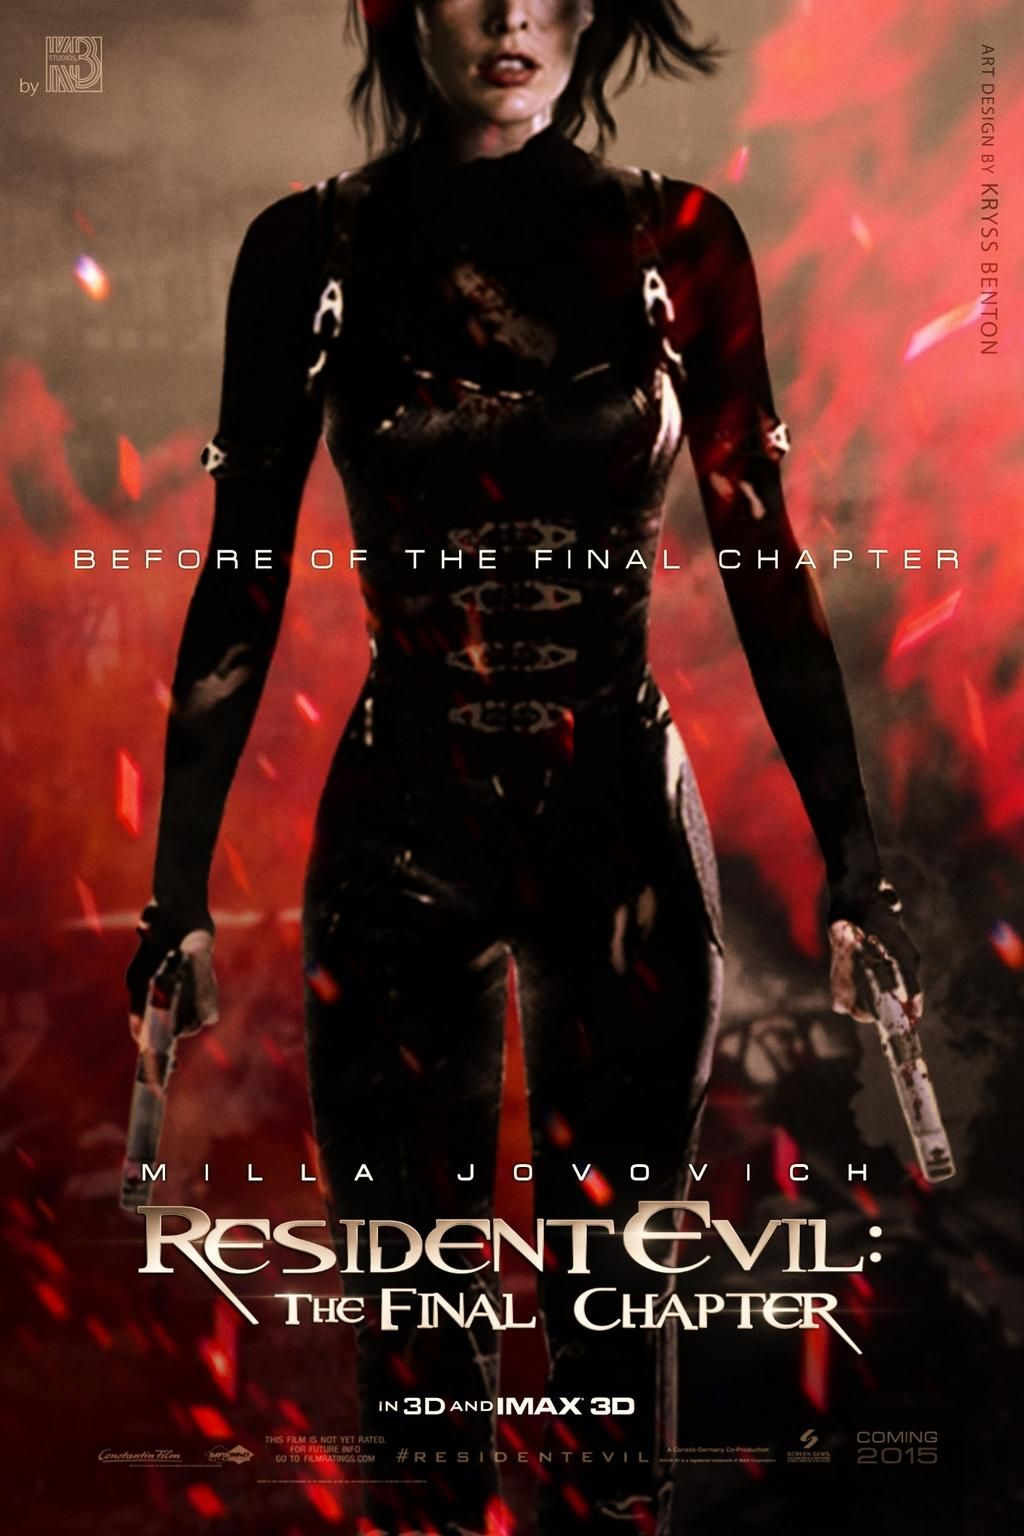 resident evil 6 peliculas